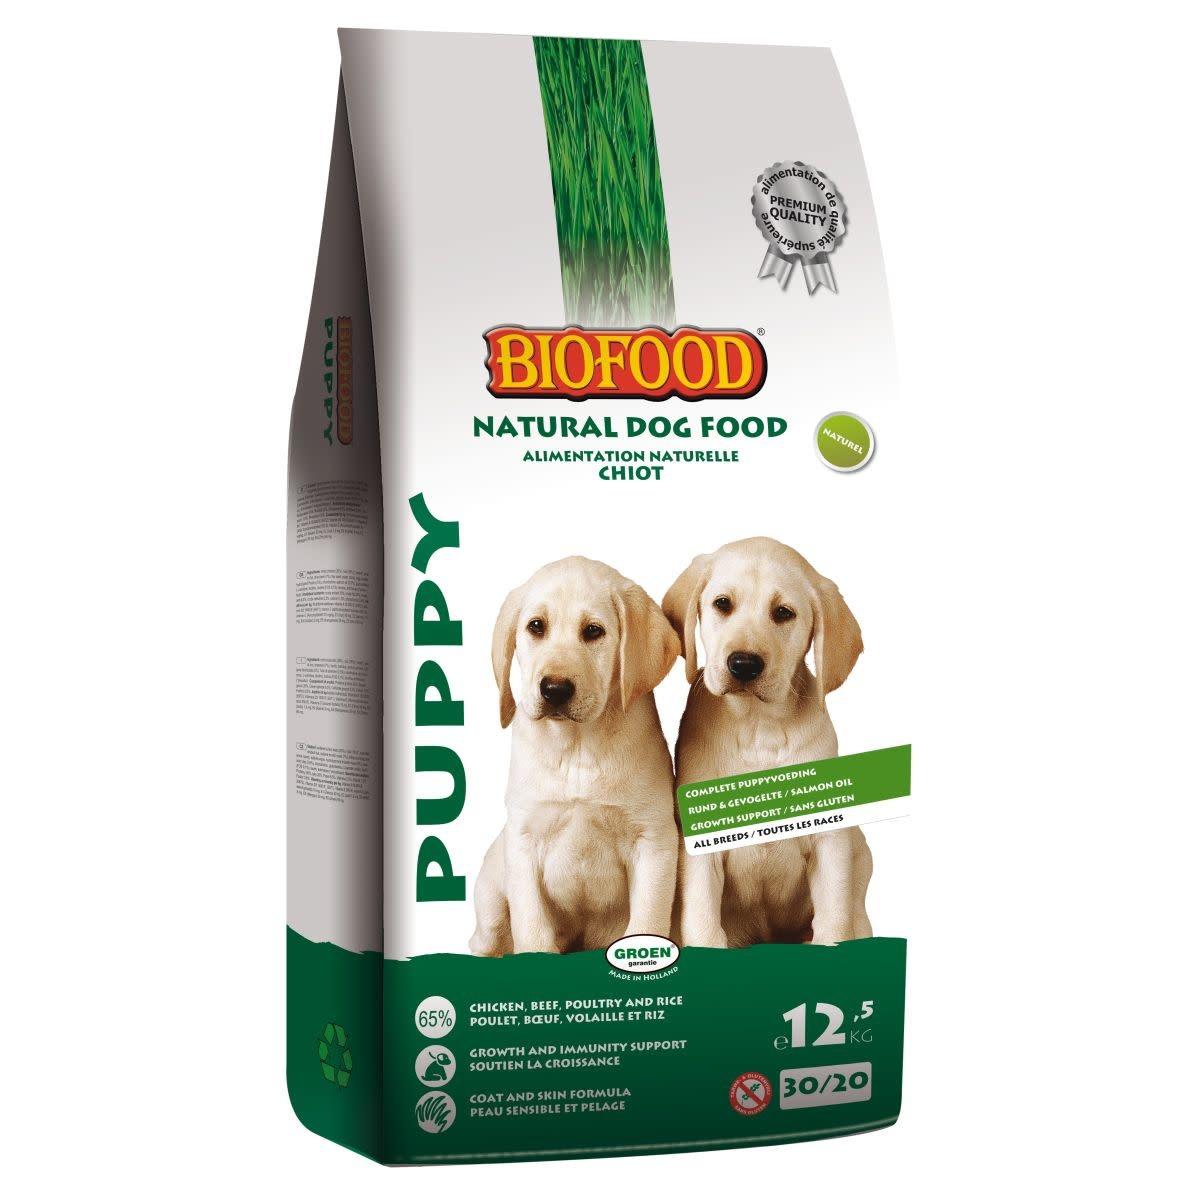 BioFood BIOFOOD - PUPPY 12,5 KG PUPPY